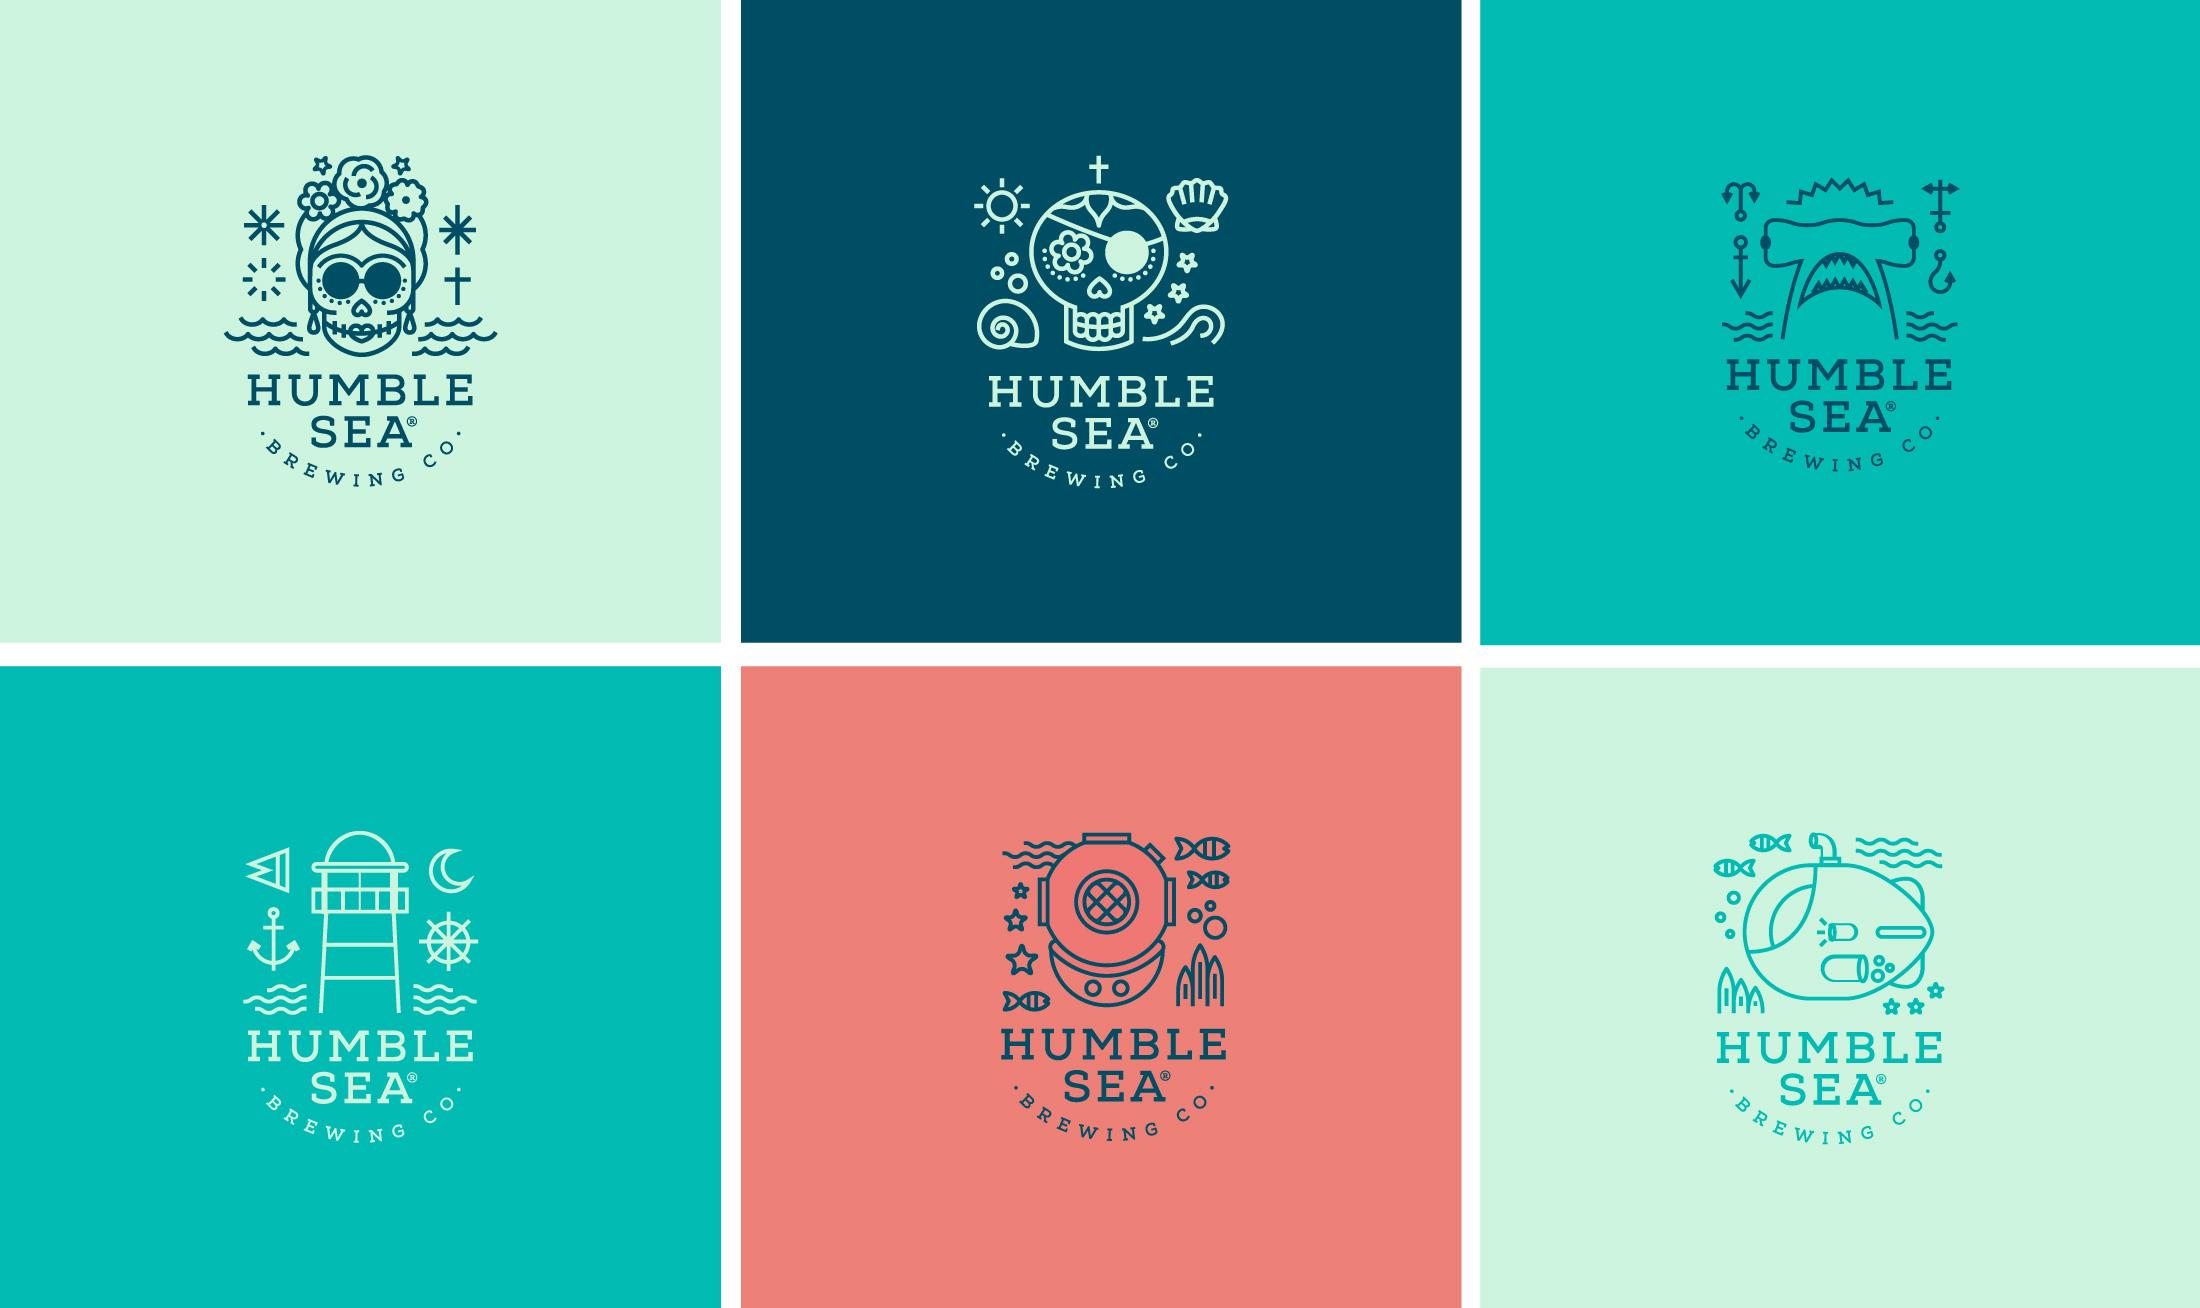 humble sea logos